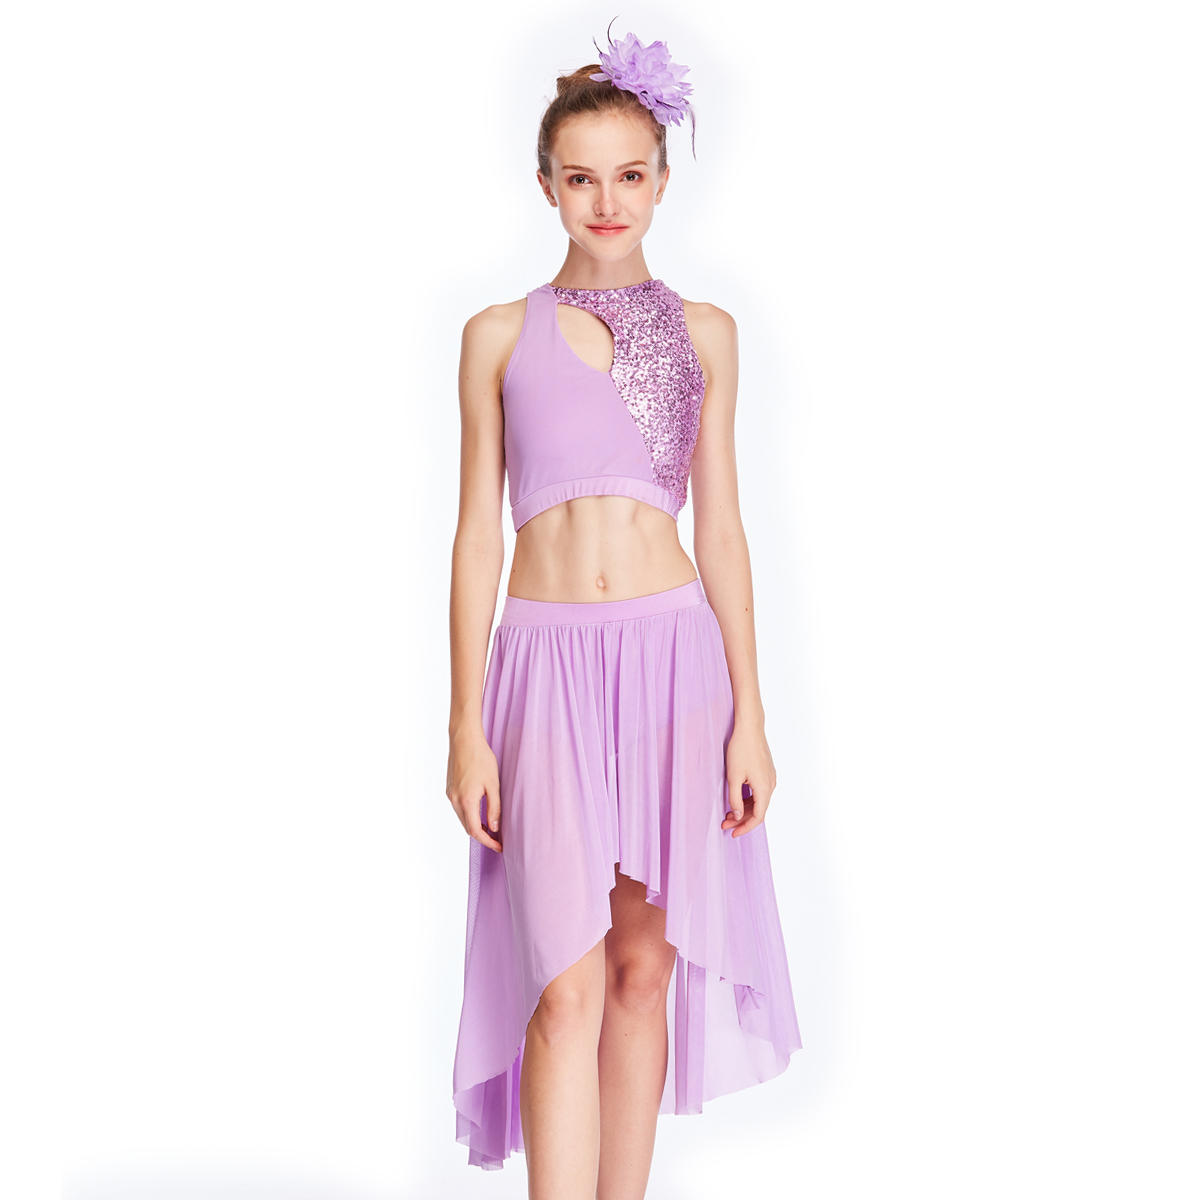 MiDee Sequins Elegant Modern Ballet Dance Costumes Belly Dance Wear